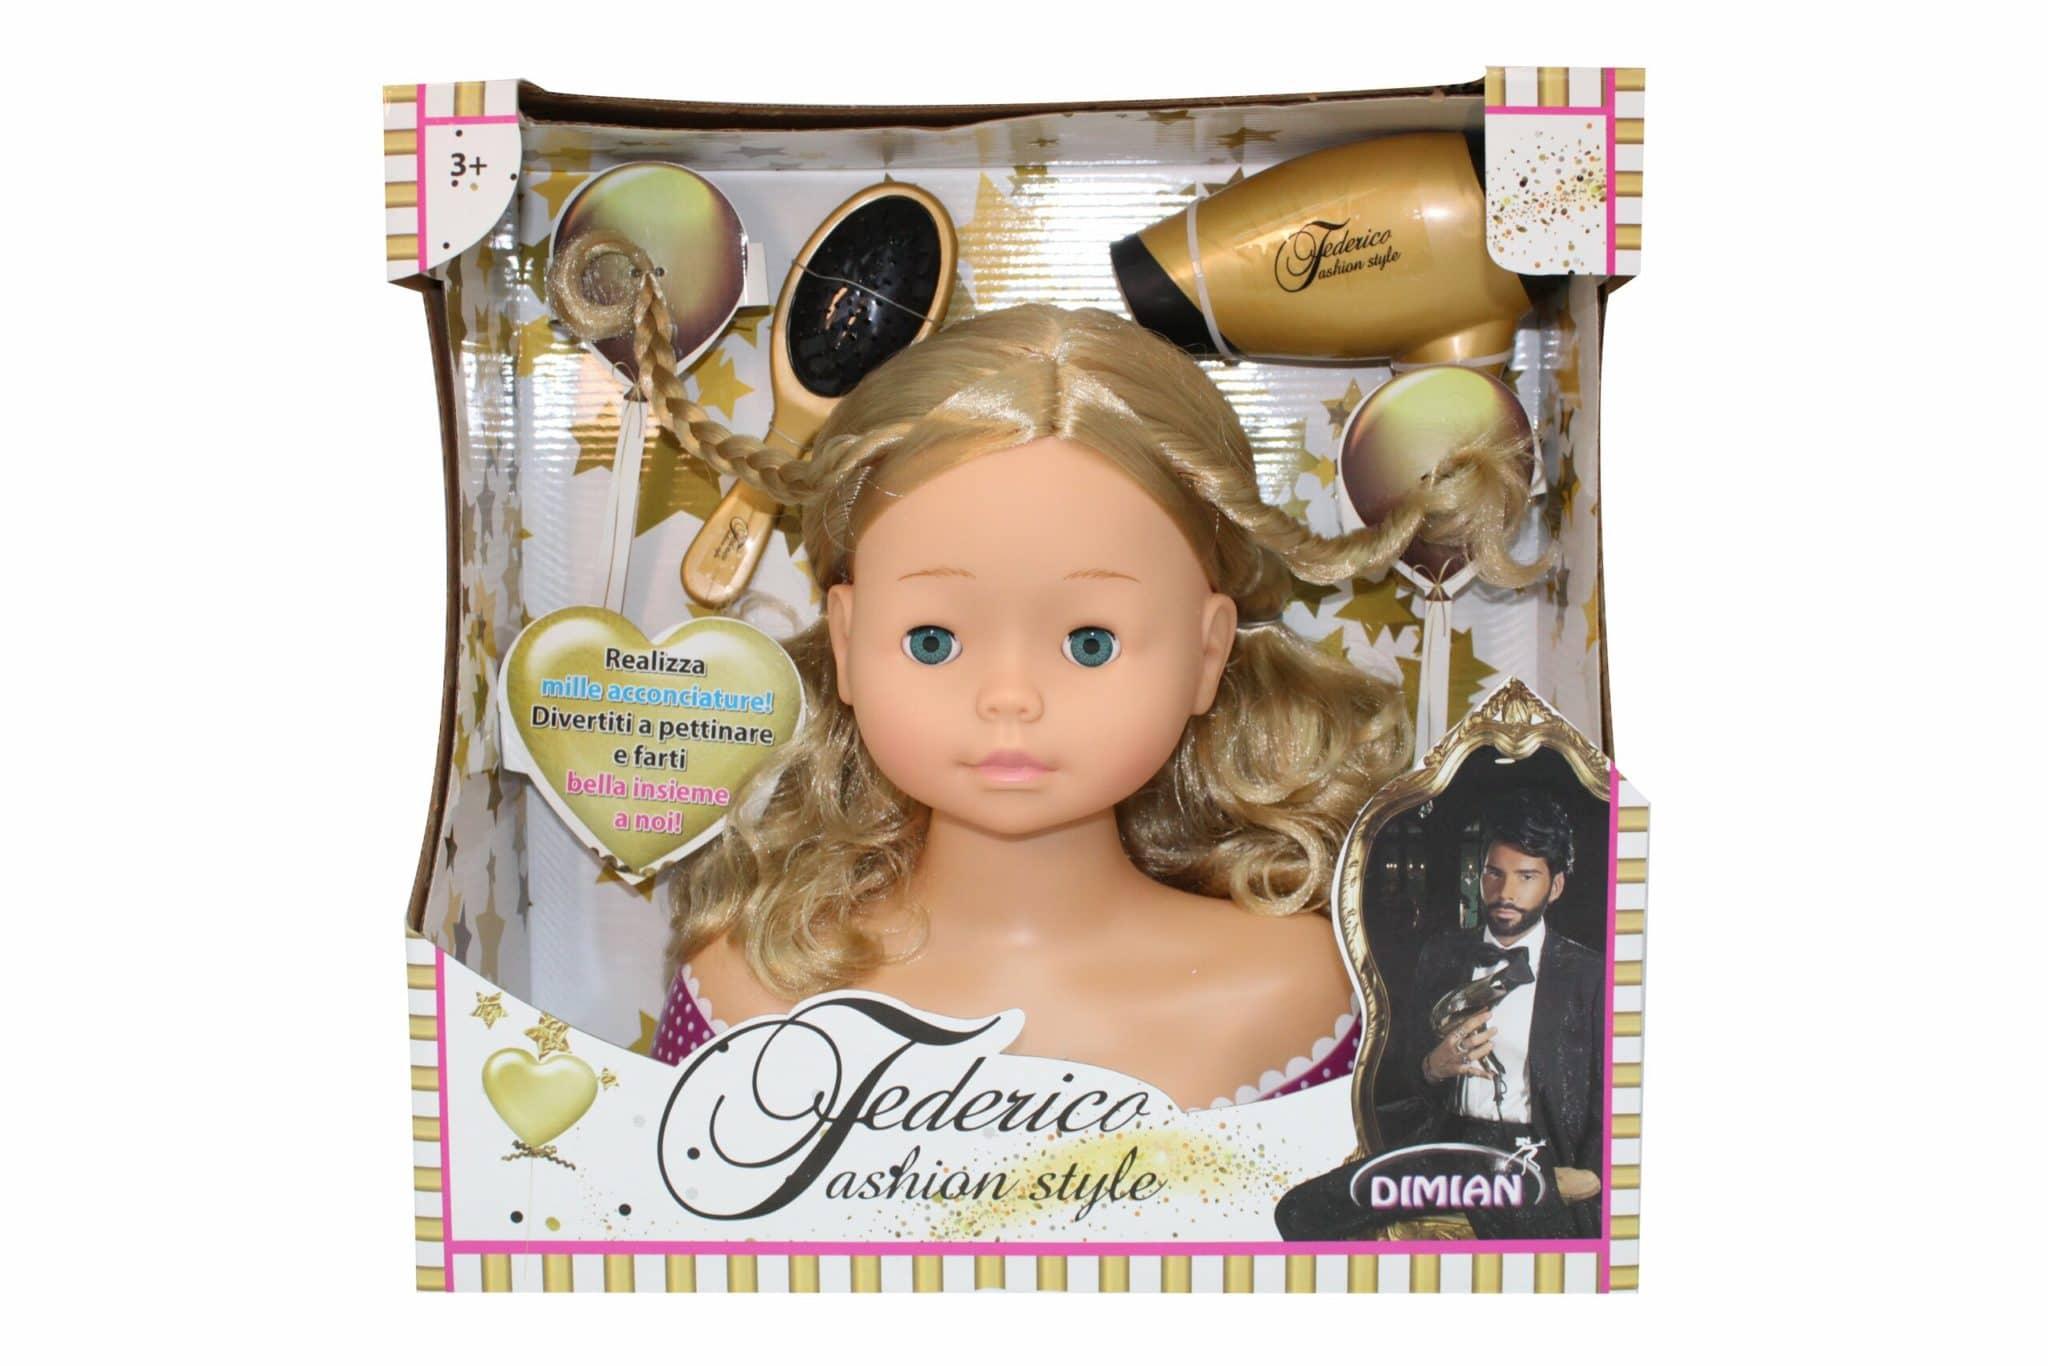 federico fashion style bambola